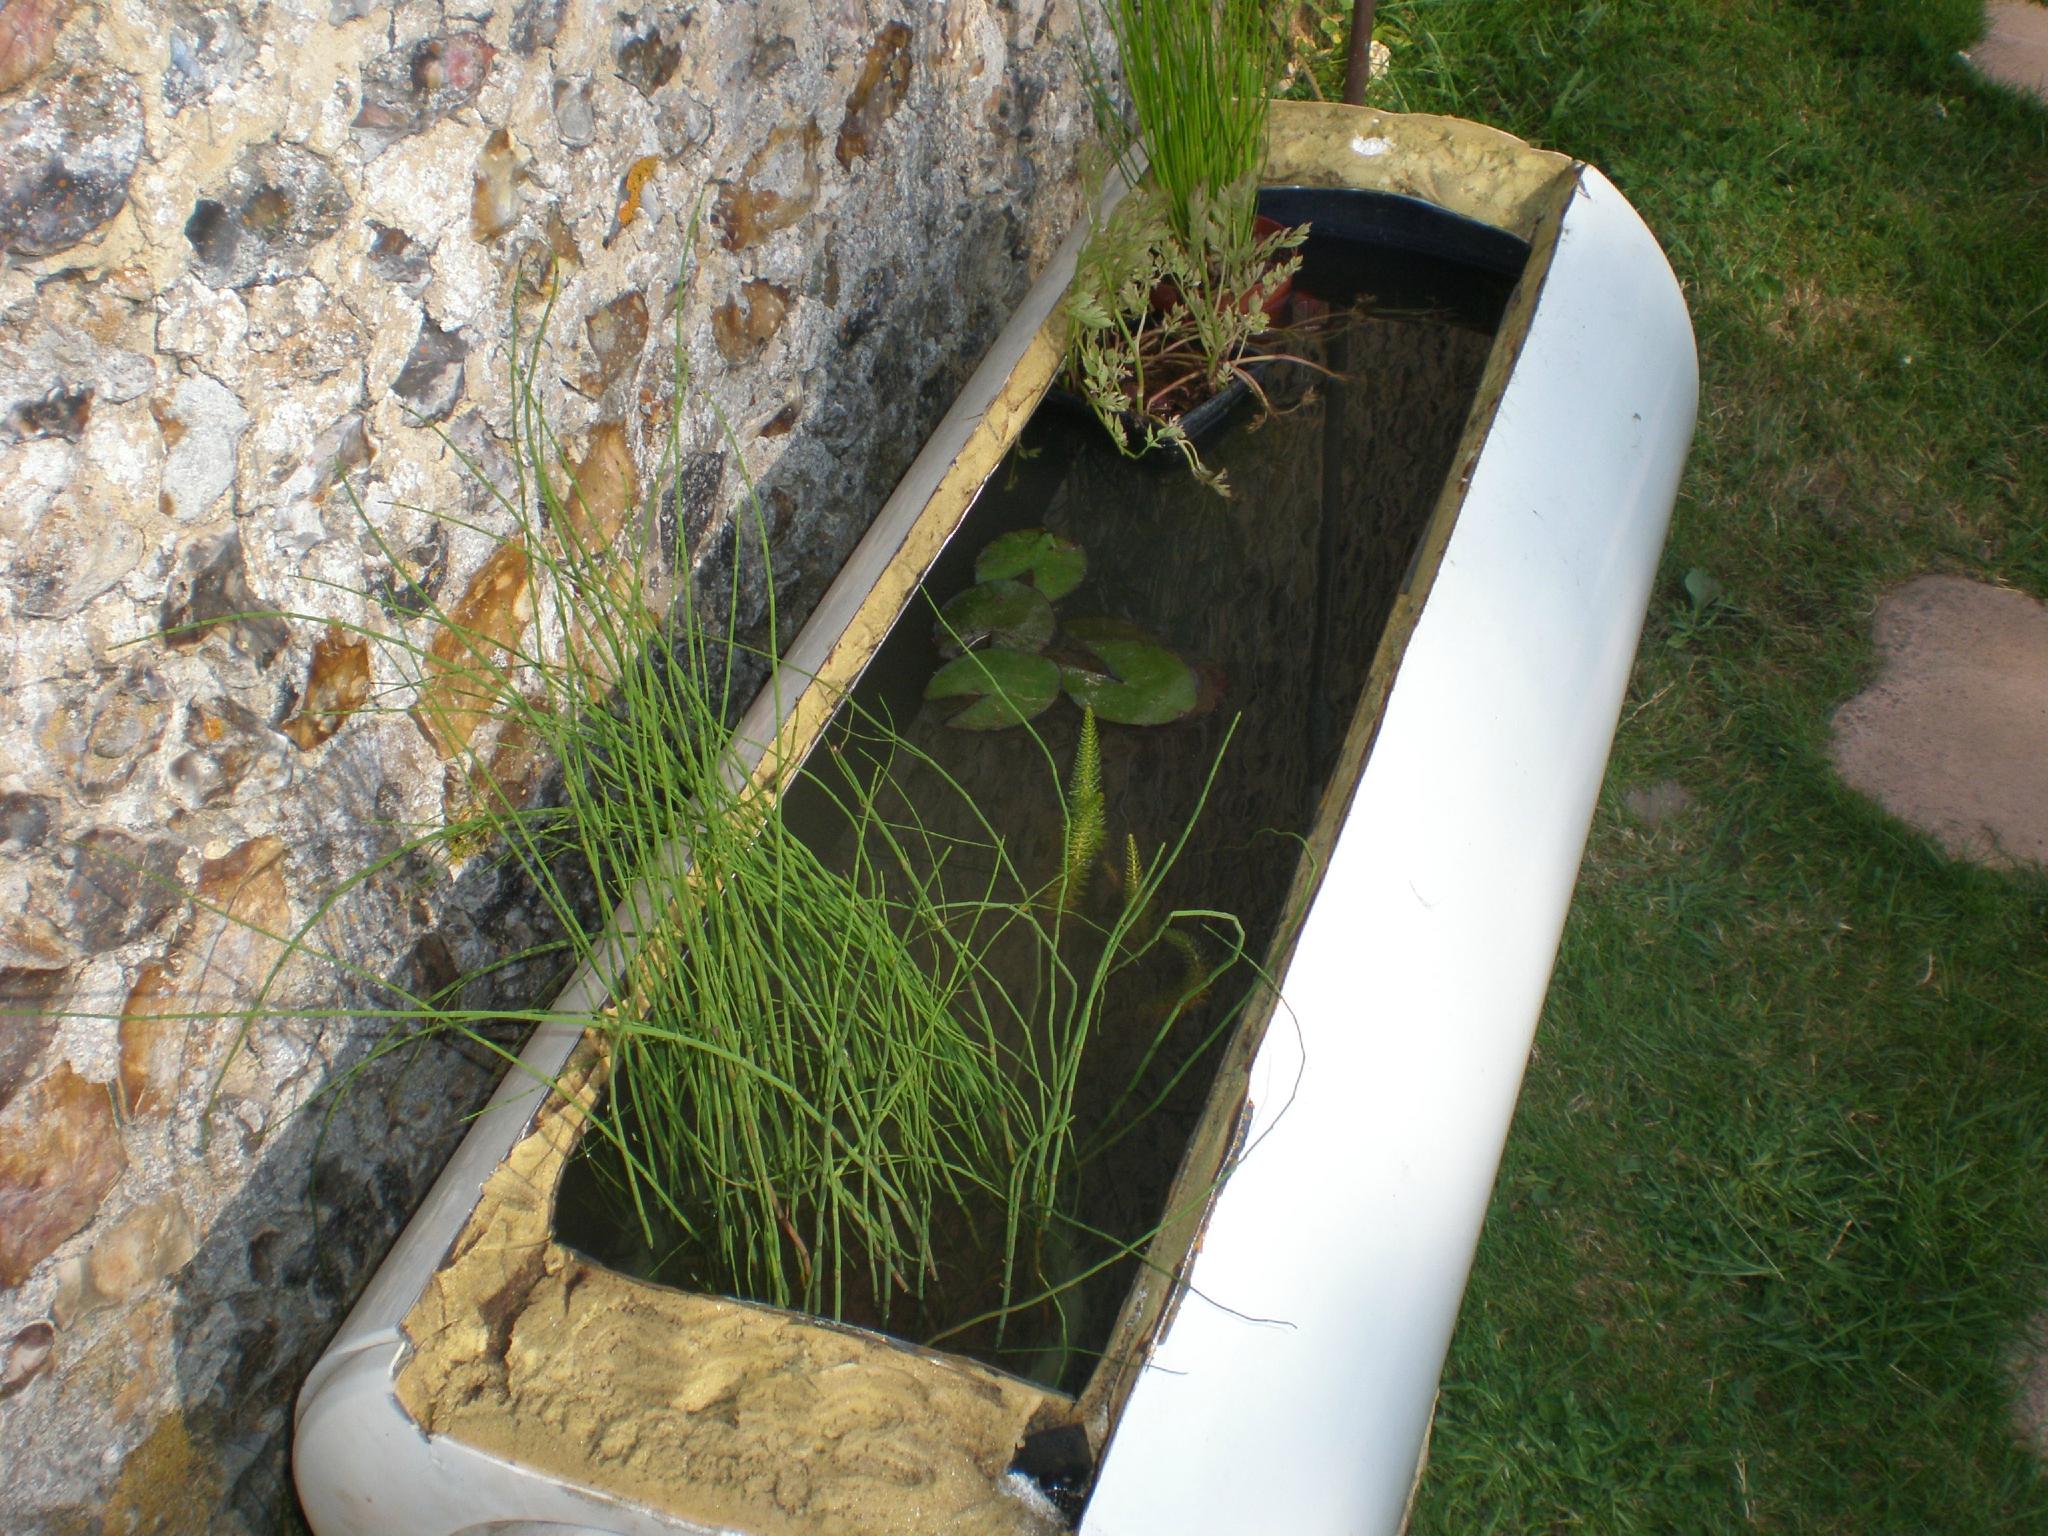 Un Petit Bassin Hors Sol - Boutures De Reves : Le Jardin De ... dedans Bassin De Jardin Hors Sol